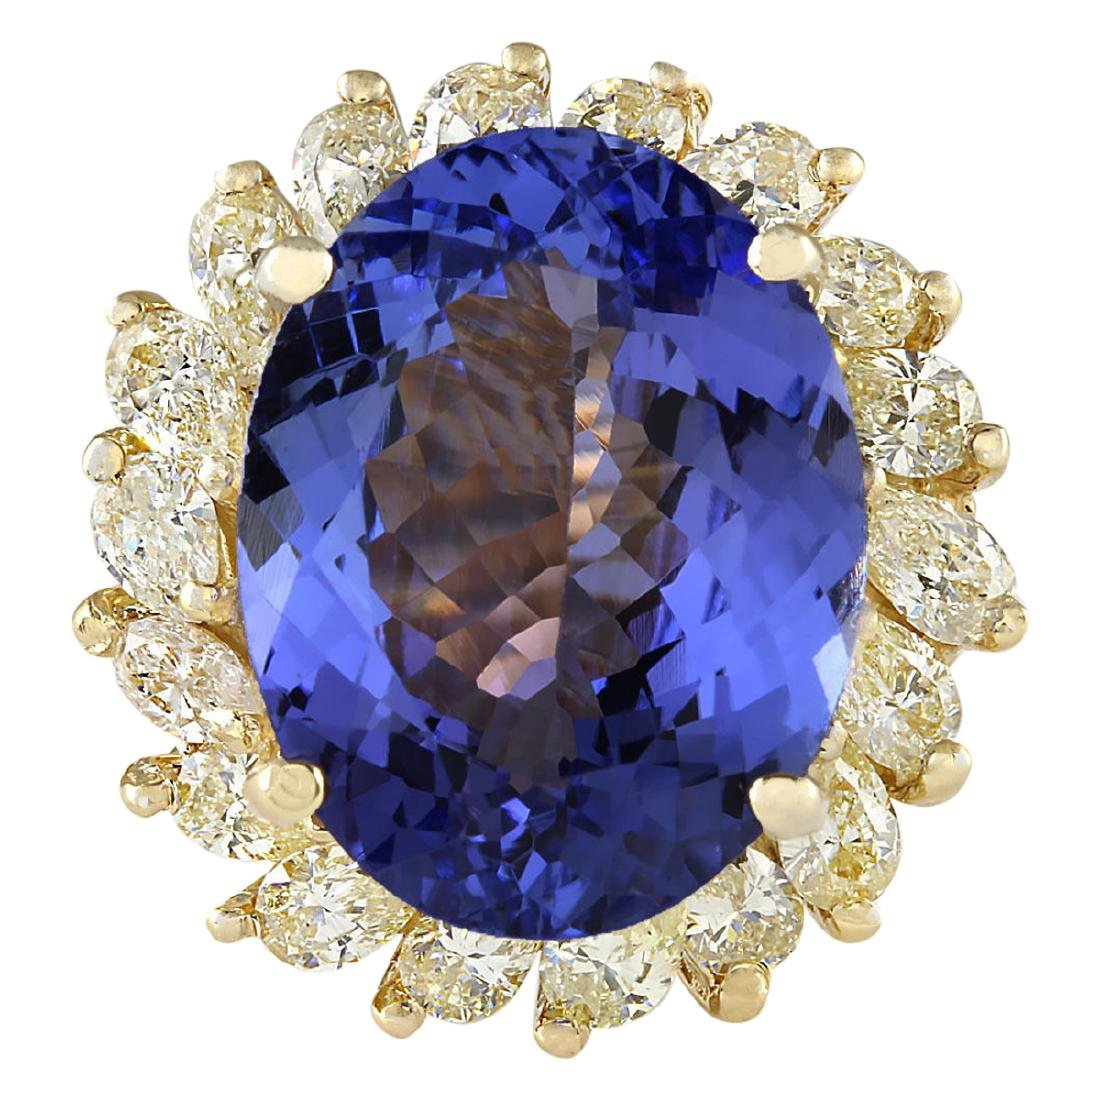 11.97 CTW Natural Tanzanite And Diamond Ring In 18K